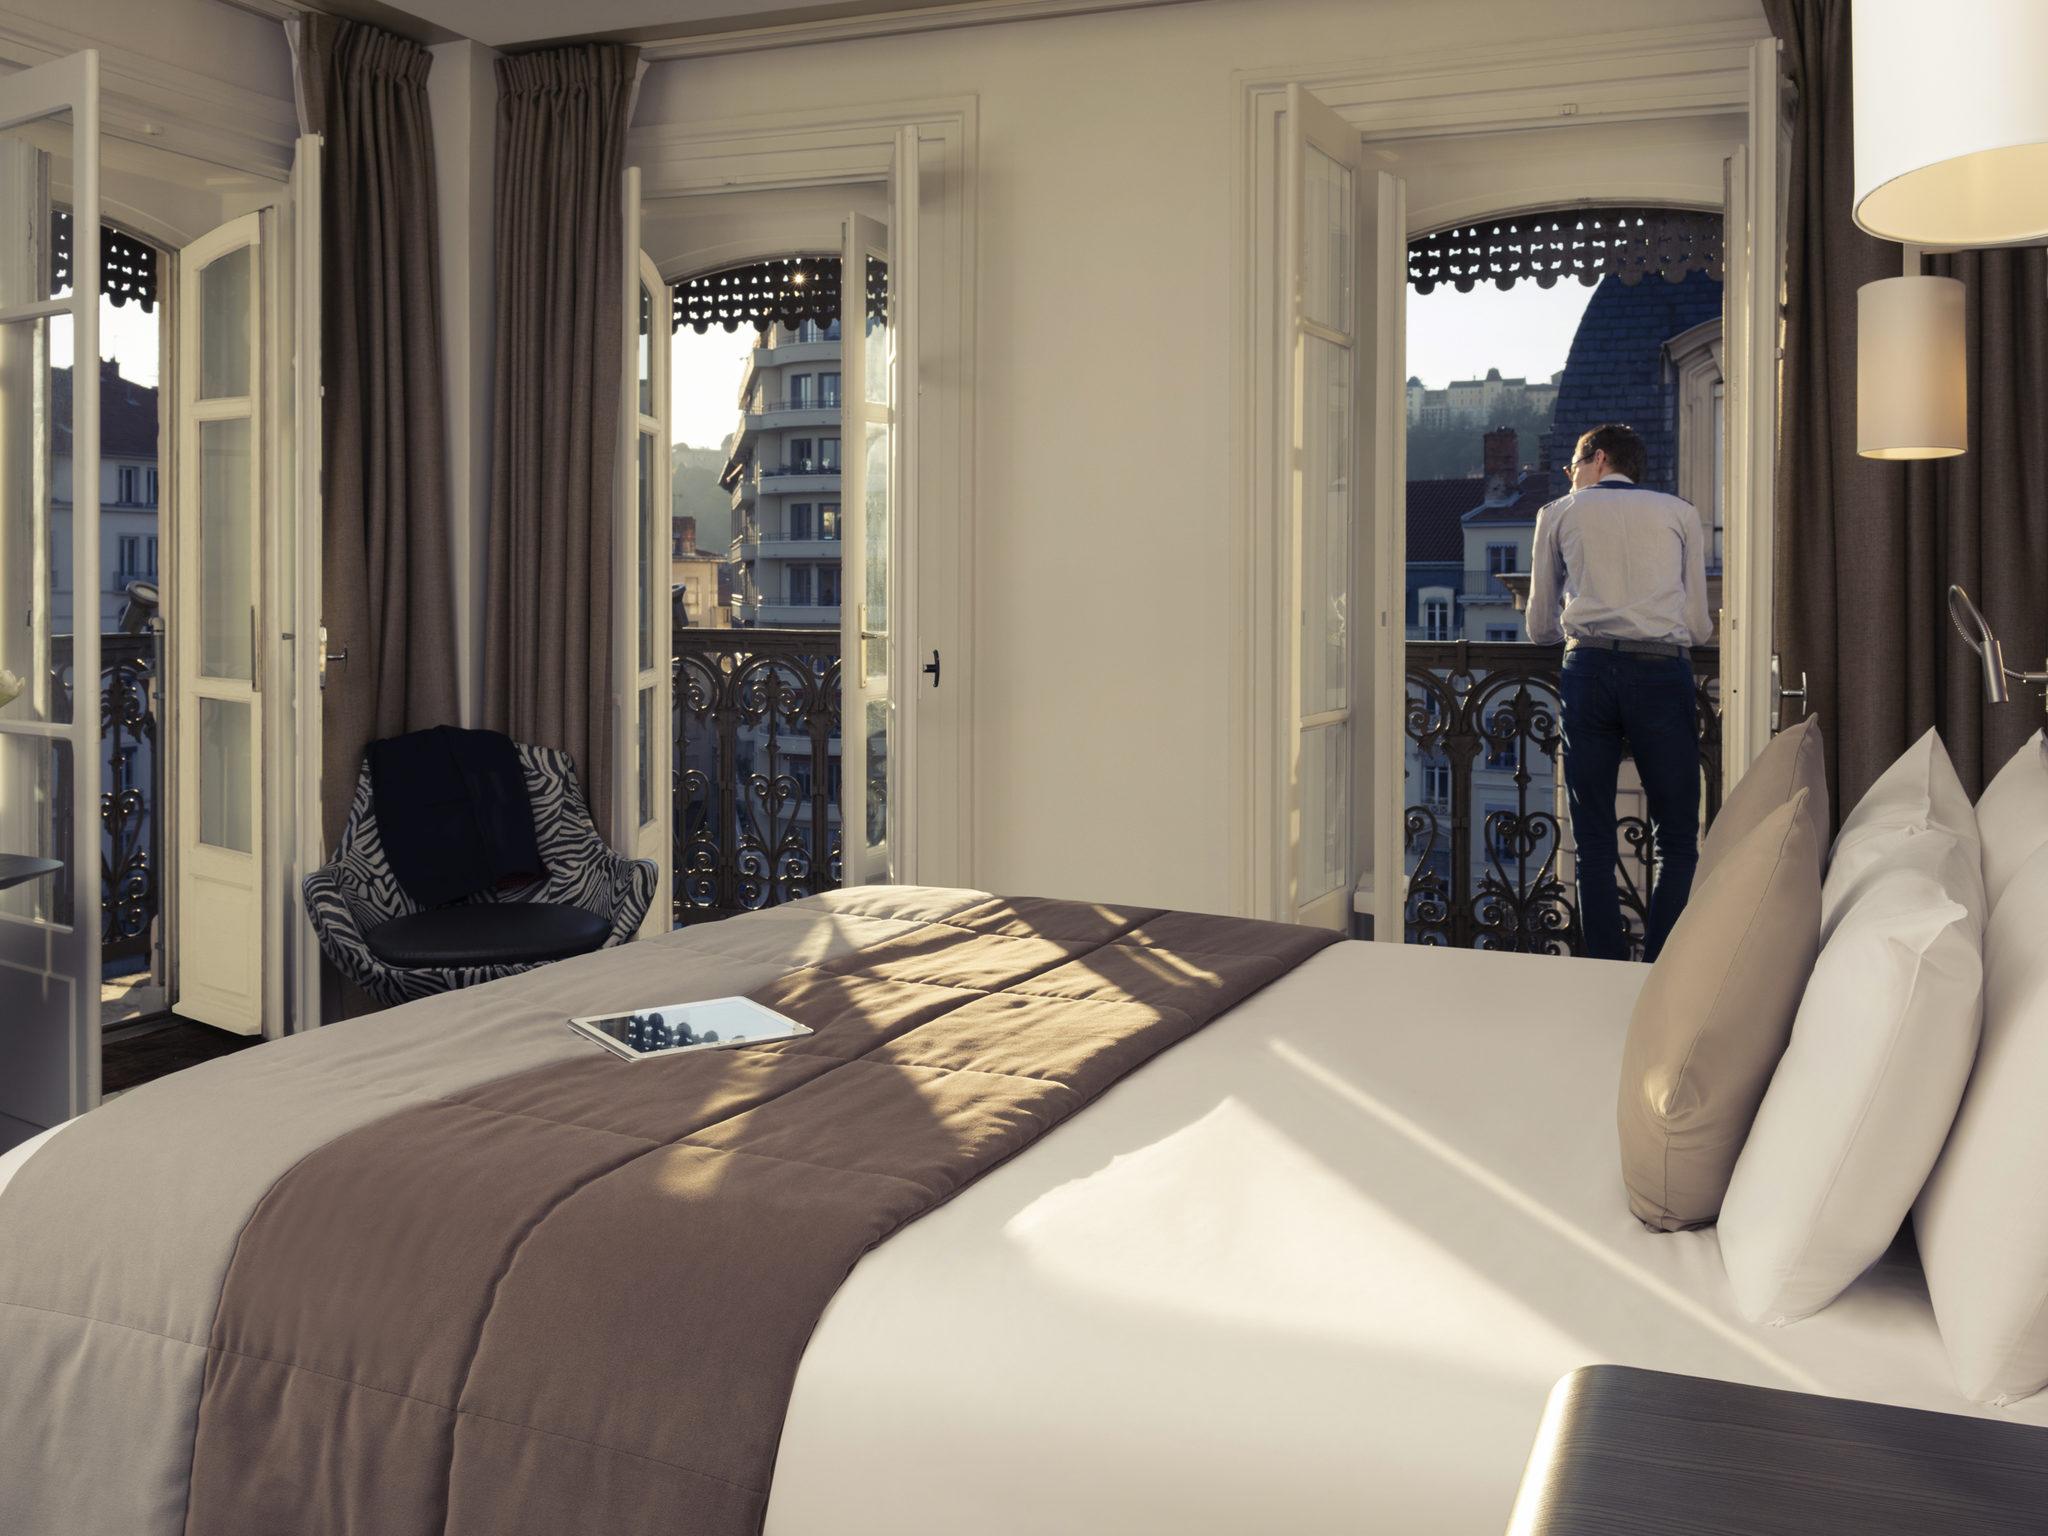 Hotel – Hotel Mercure Lyon Centro Beaux Arts